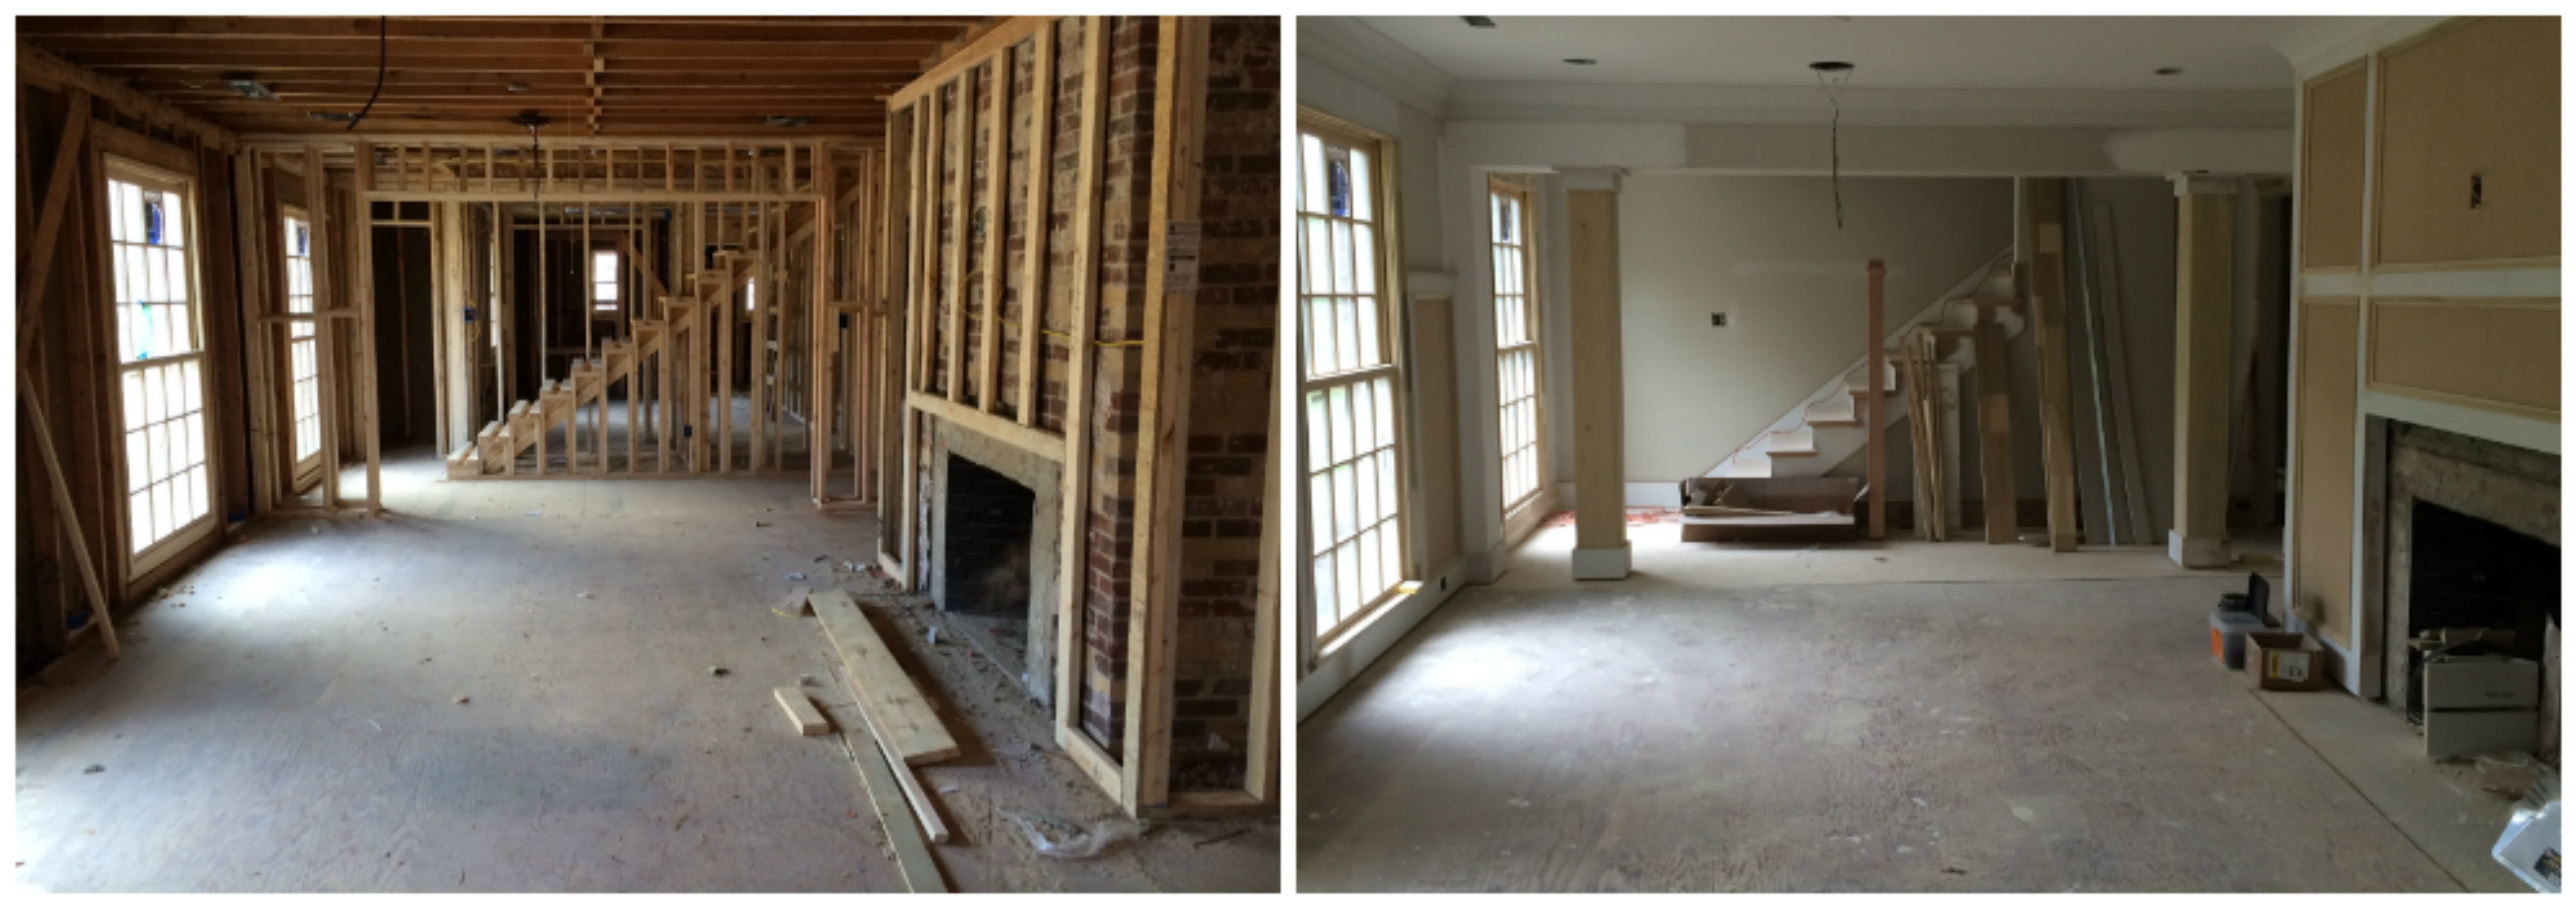 1950 S Cherokee Rancher Renovation Beauty In Progress Mccamy Construction Mccamy Construction